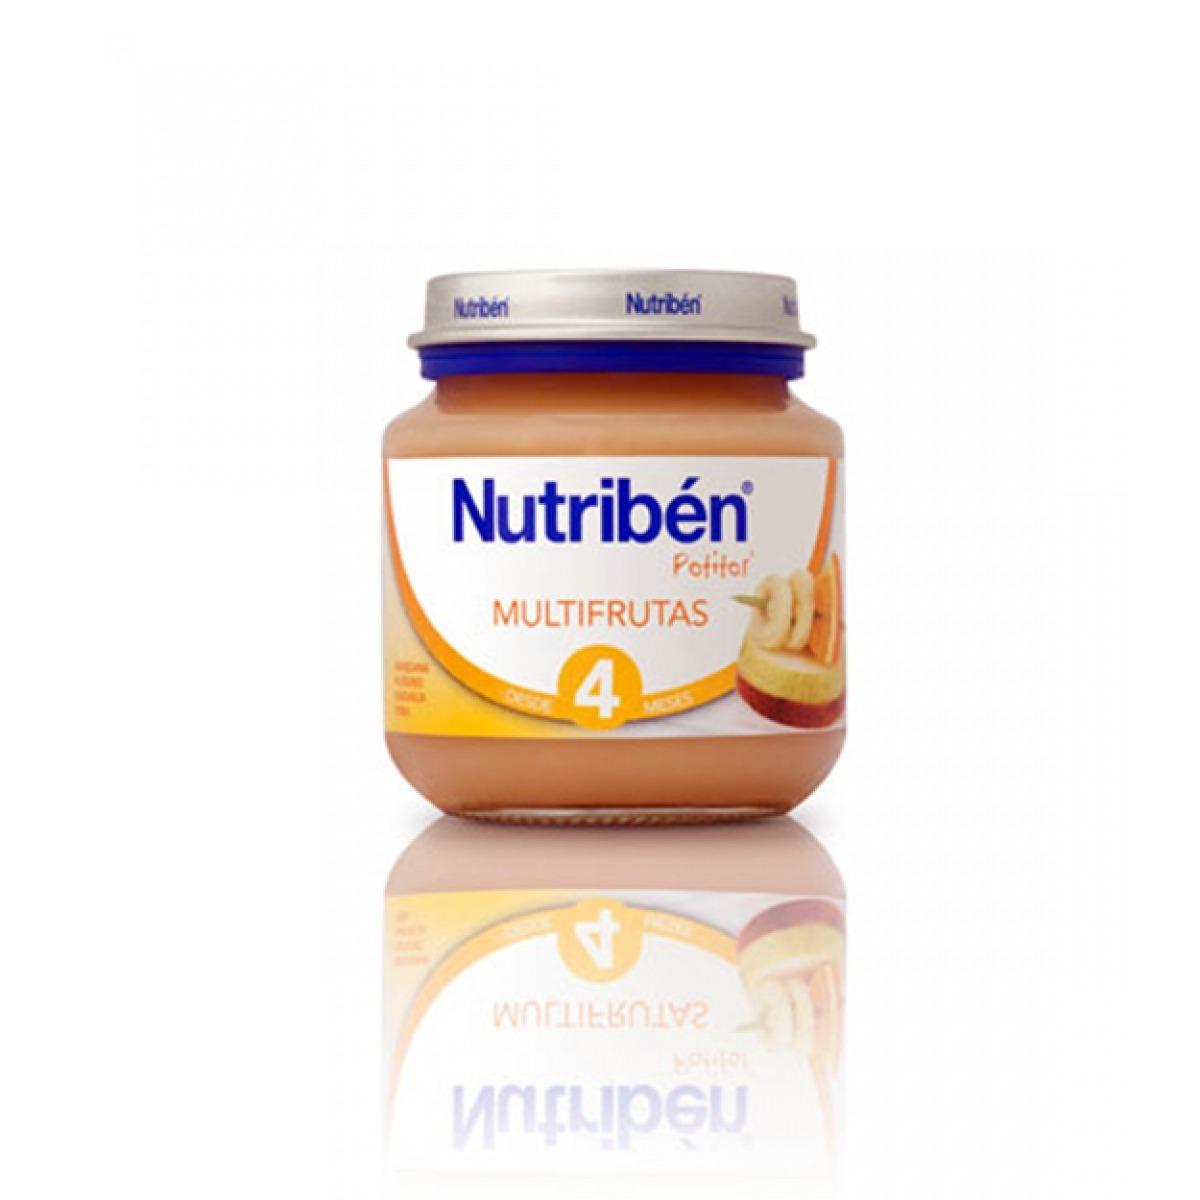 NUTRIBEN POTITO MULTIFRUTAS 130 G.